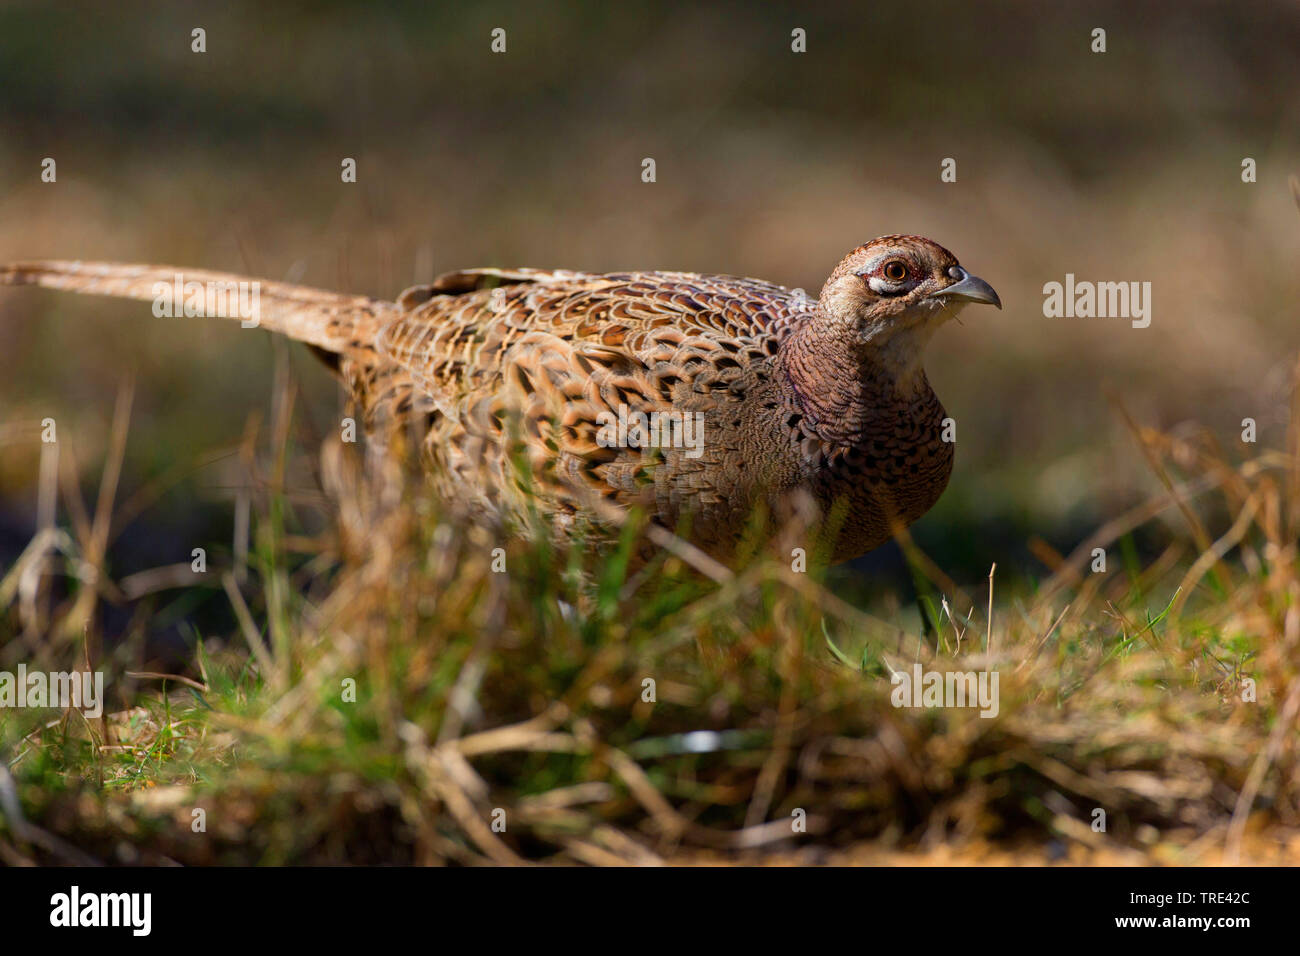 Fasan, Ringfasan, Ring-Fasan, Jagdfasan, Jagd-Fasan (Phasianus colchicus), Henne, Deutschland | Common pheasant, Caucasus Pheasant, Caucasian Pheasant - Stock Image